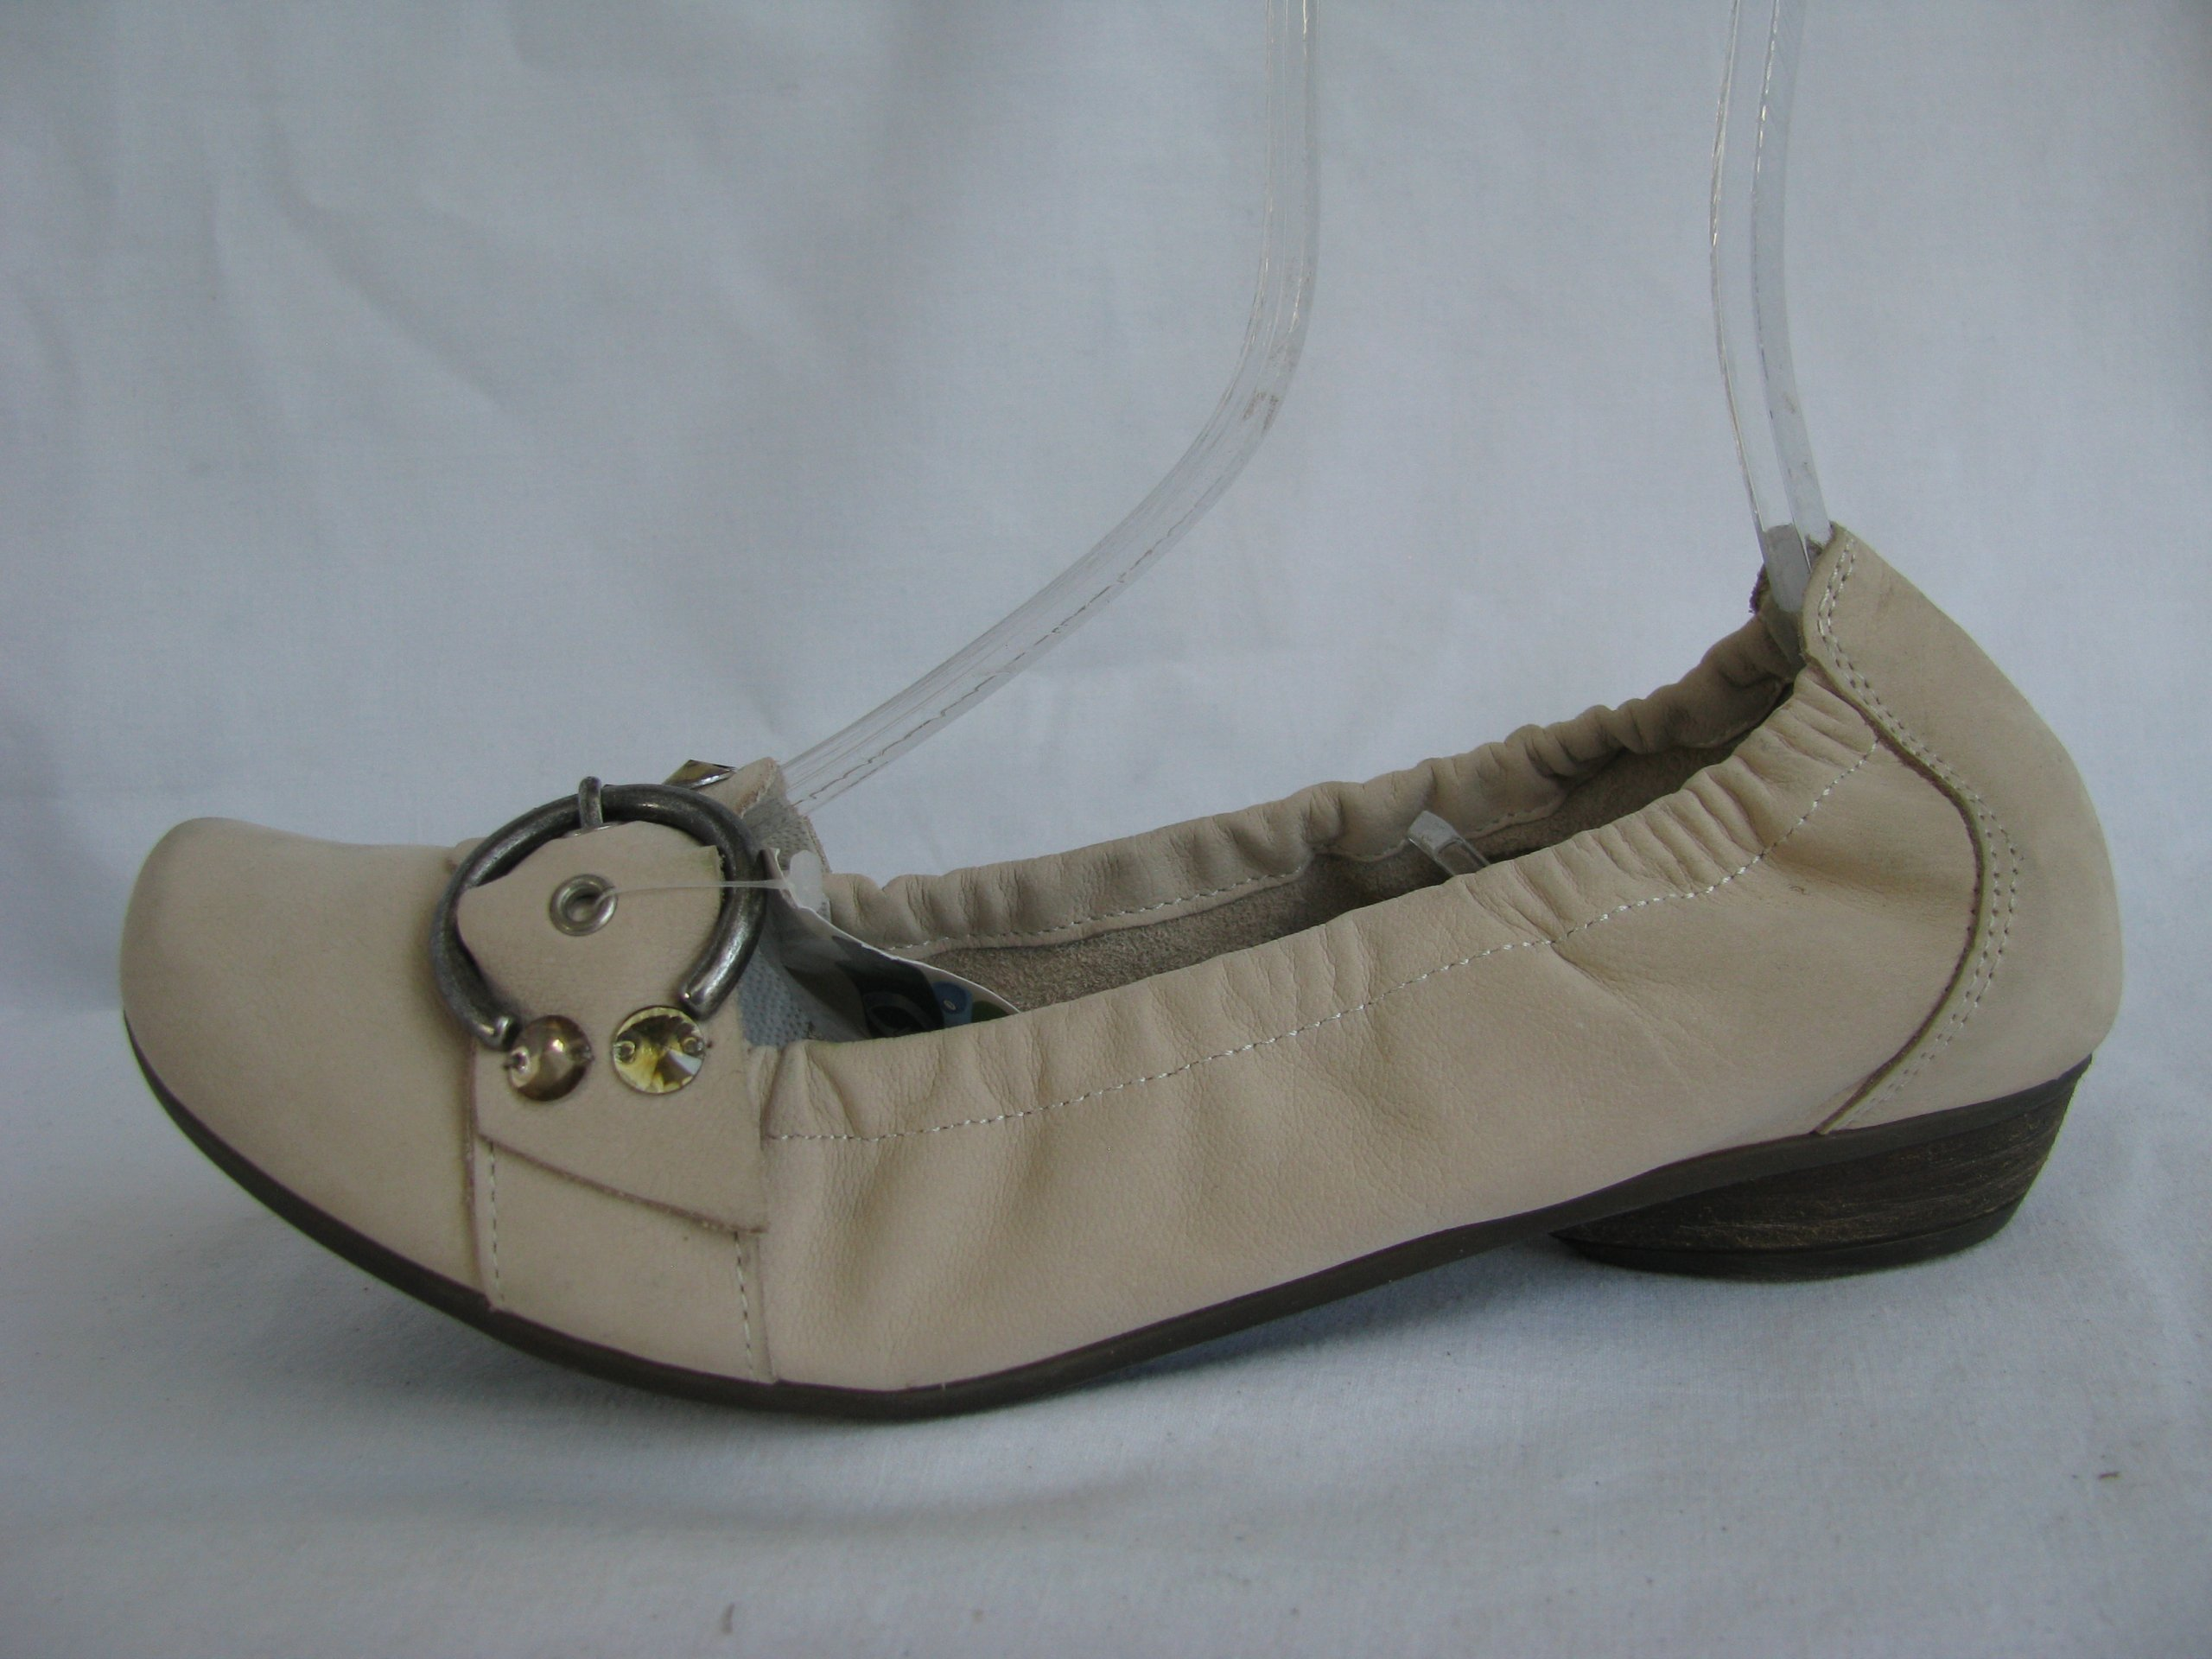 d3762c0f25cde REMONTE DORNDORF baleriny r 38 (24,5cm) skóra nowe - 7327196299 ...